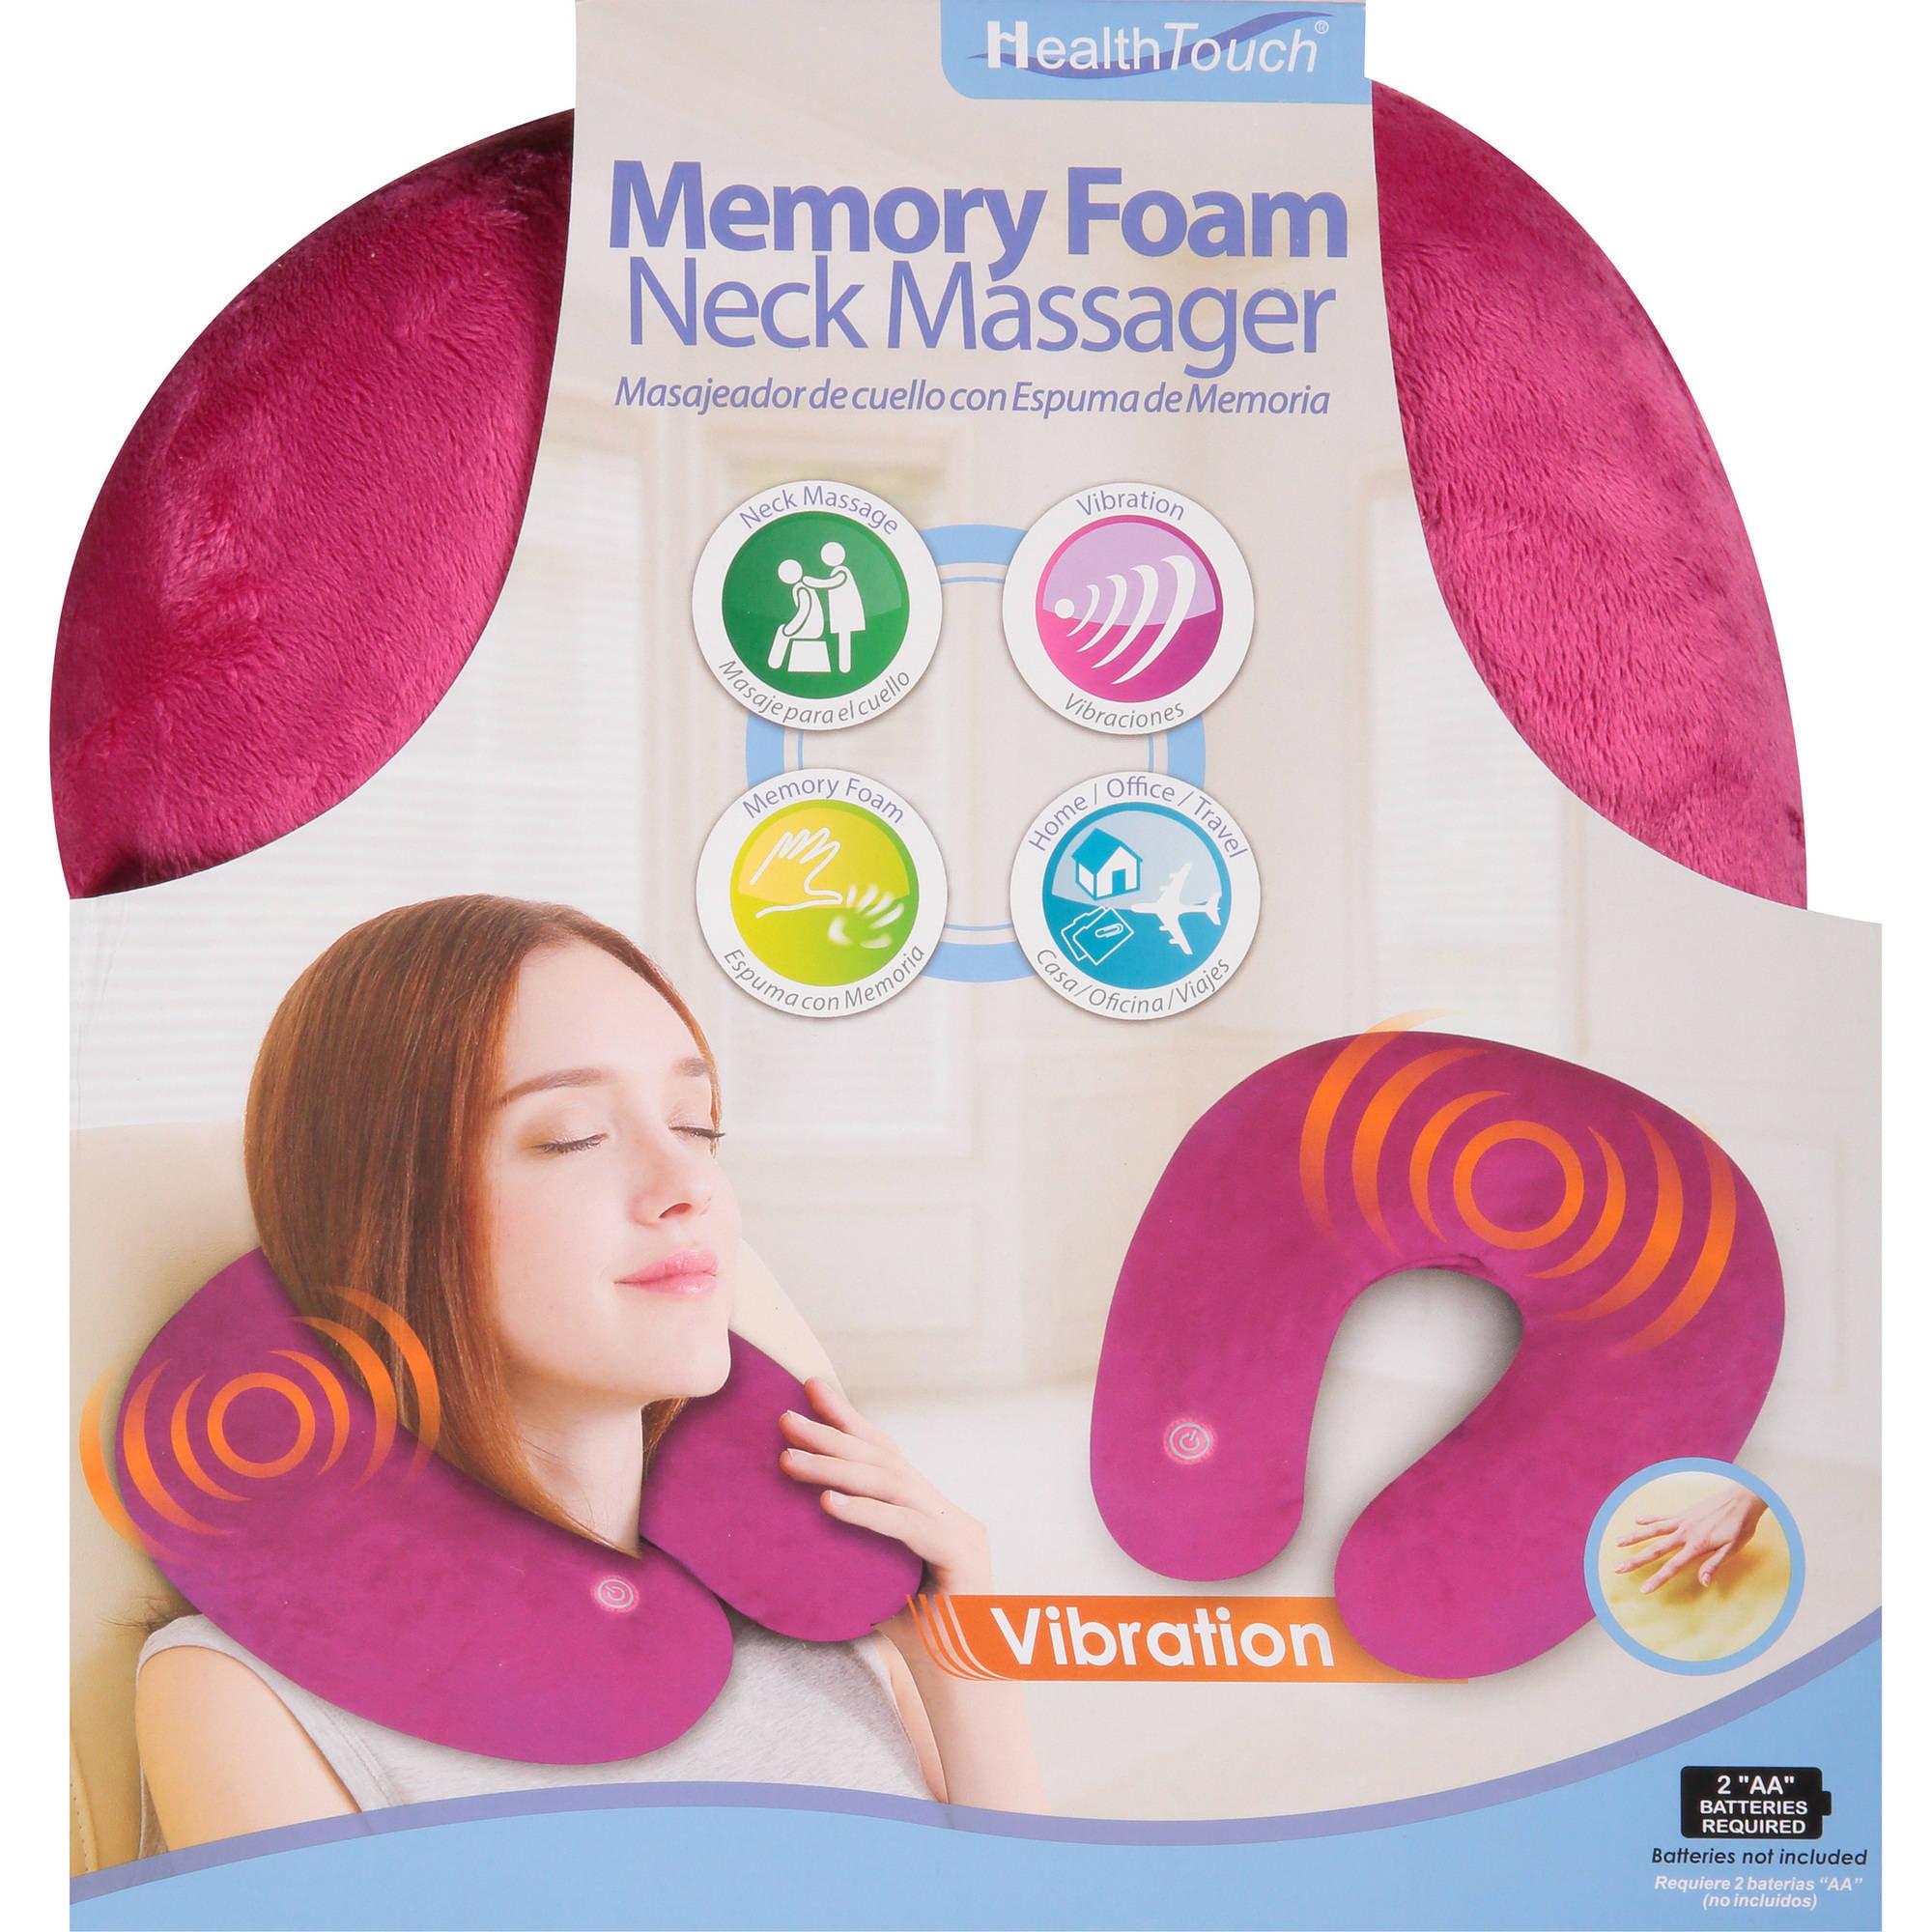 Health Touch Memory Foam Neck Massager, Pink